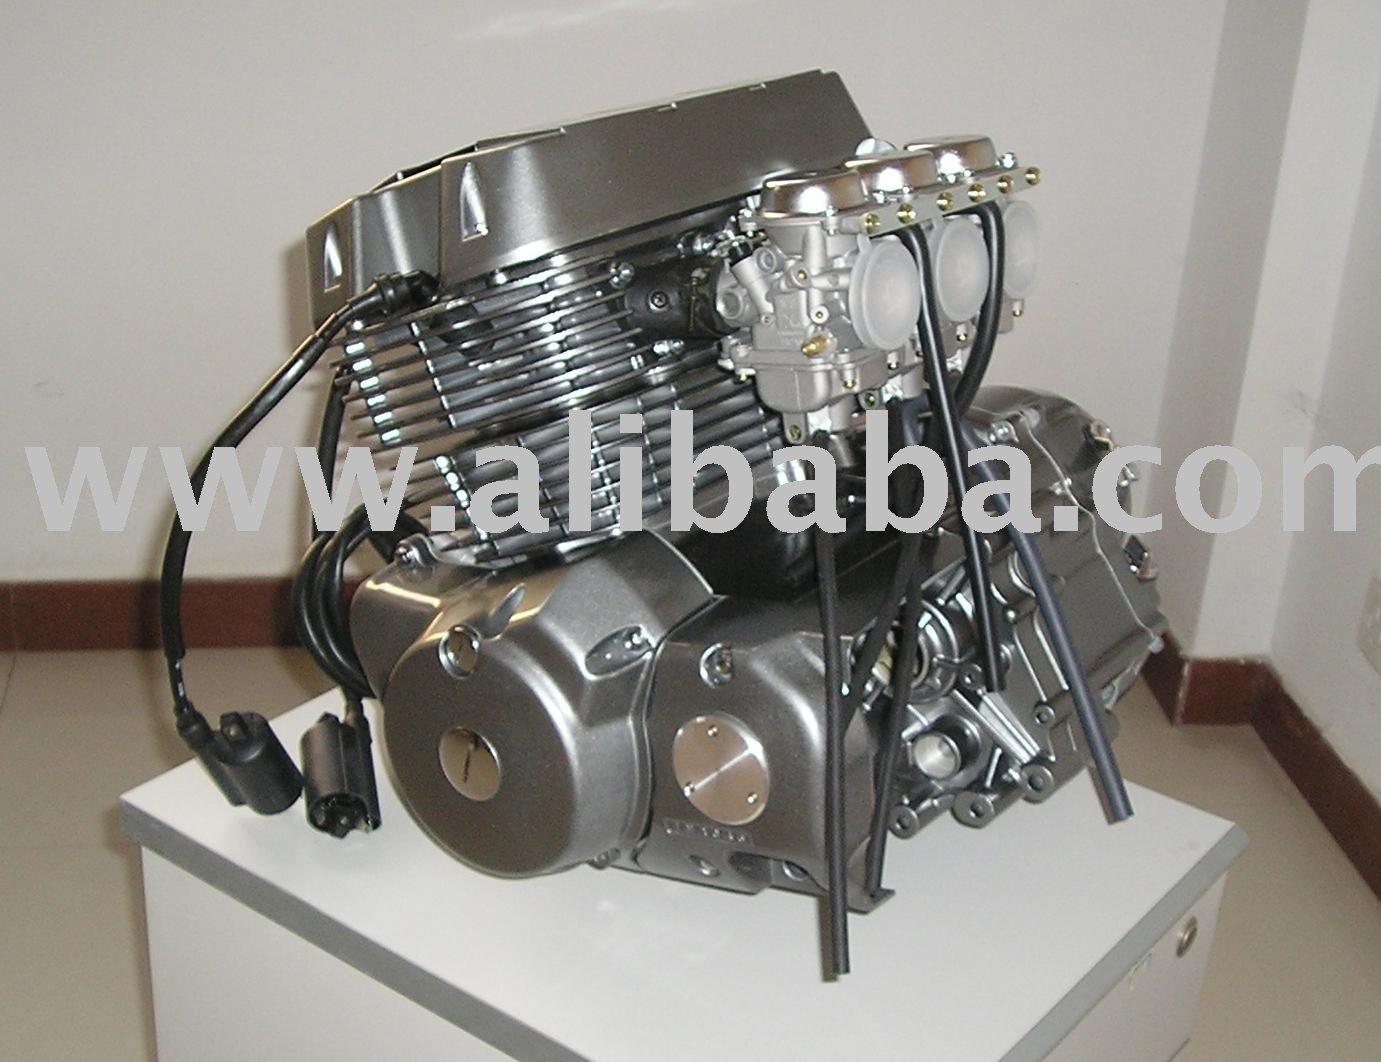 nitro rc car diagram  nitro  free engine image for user